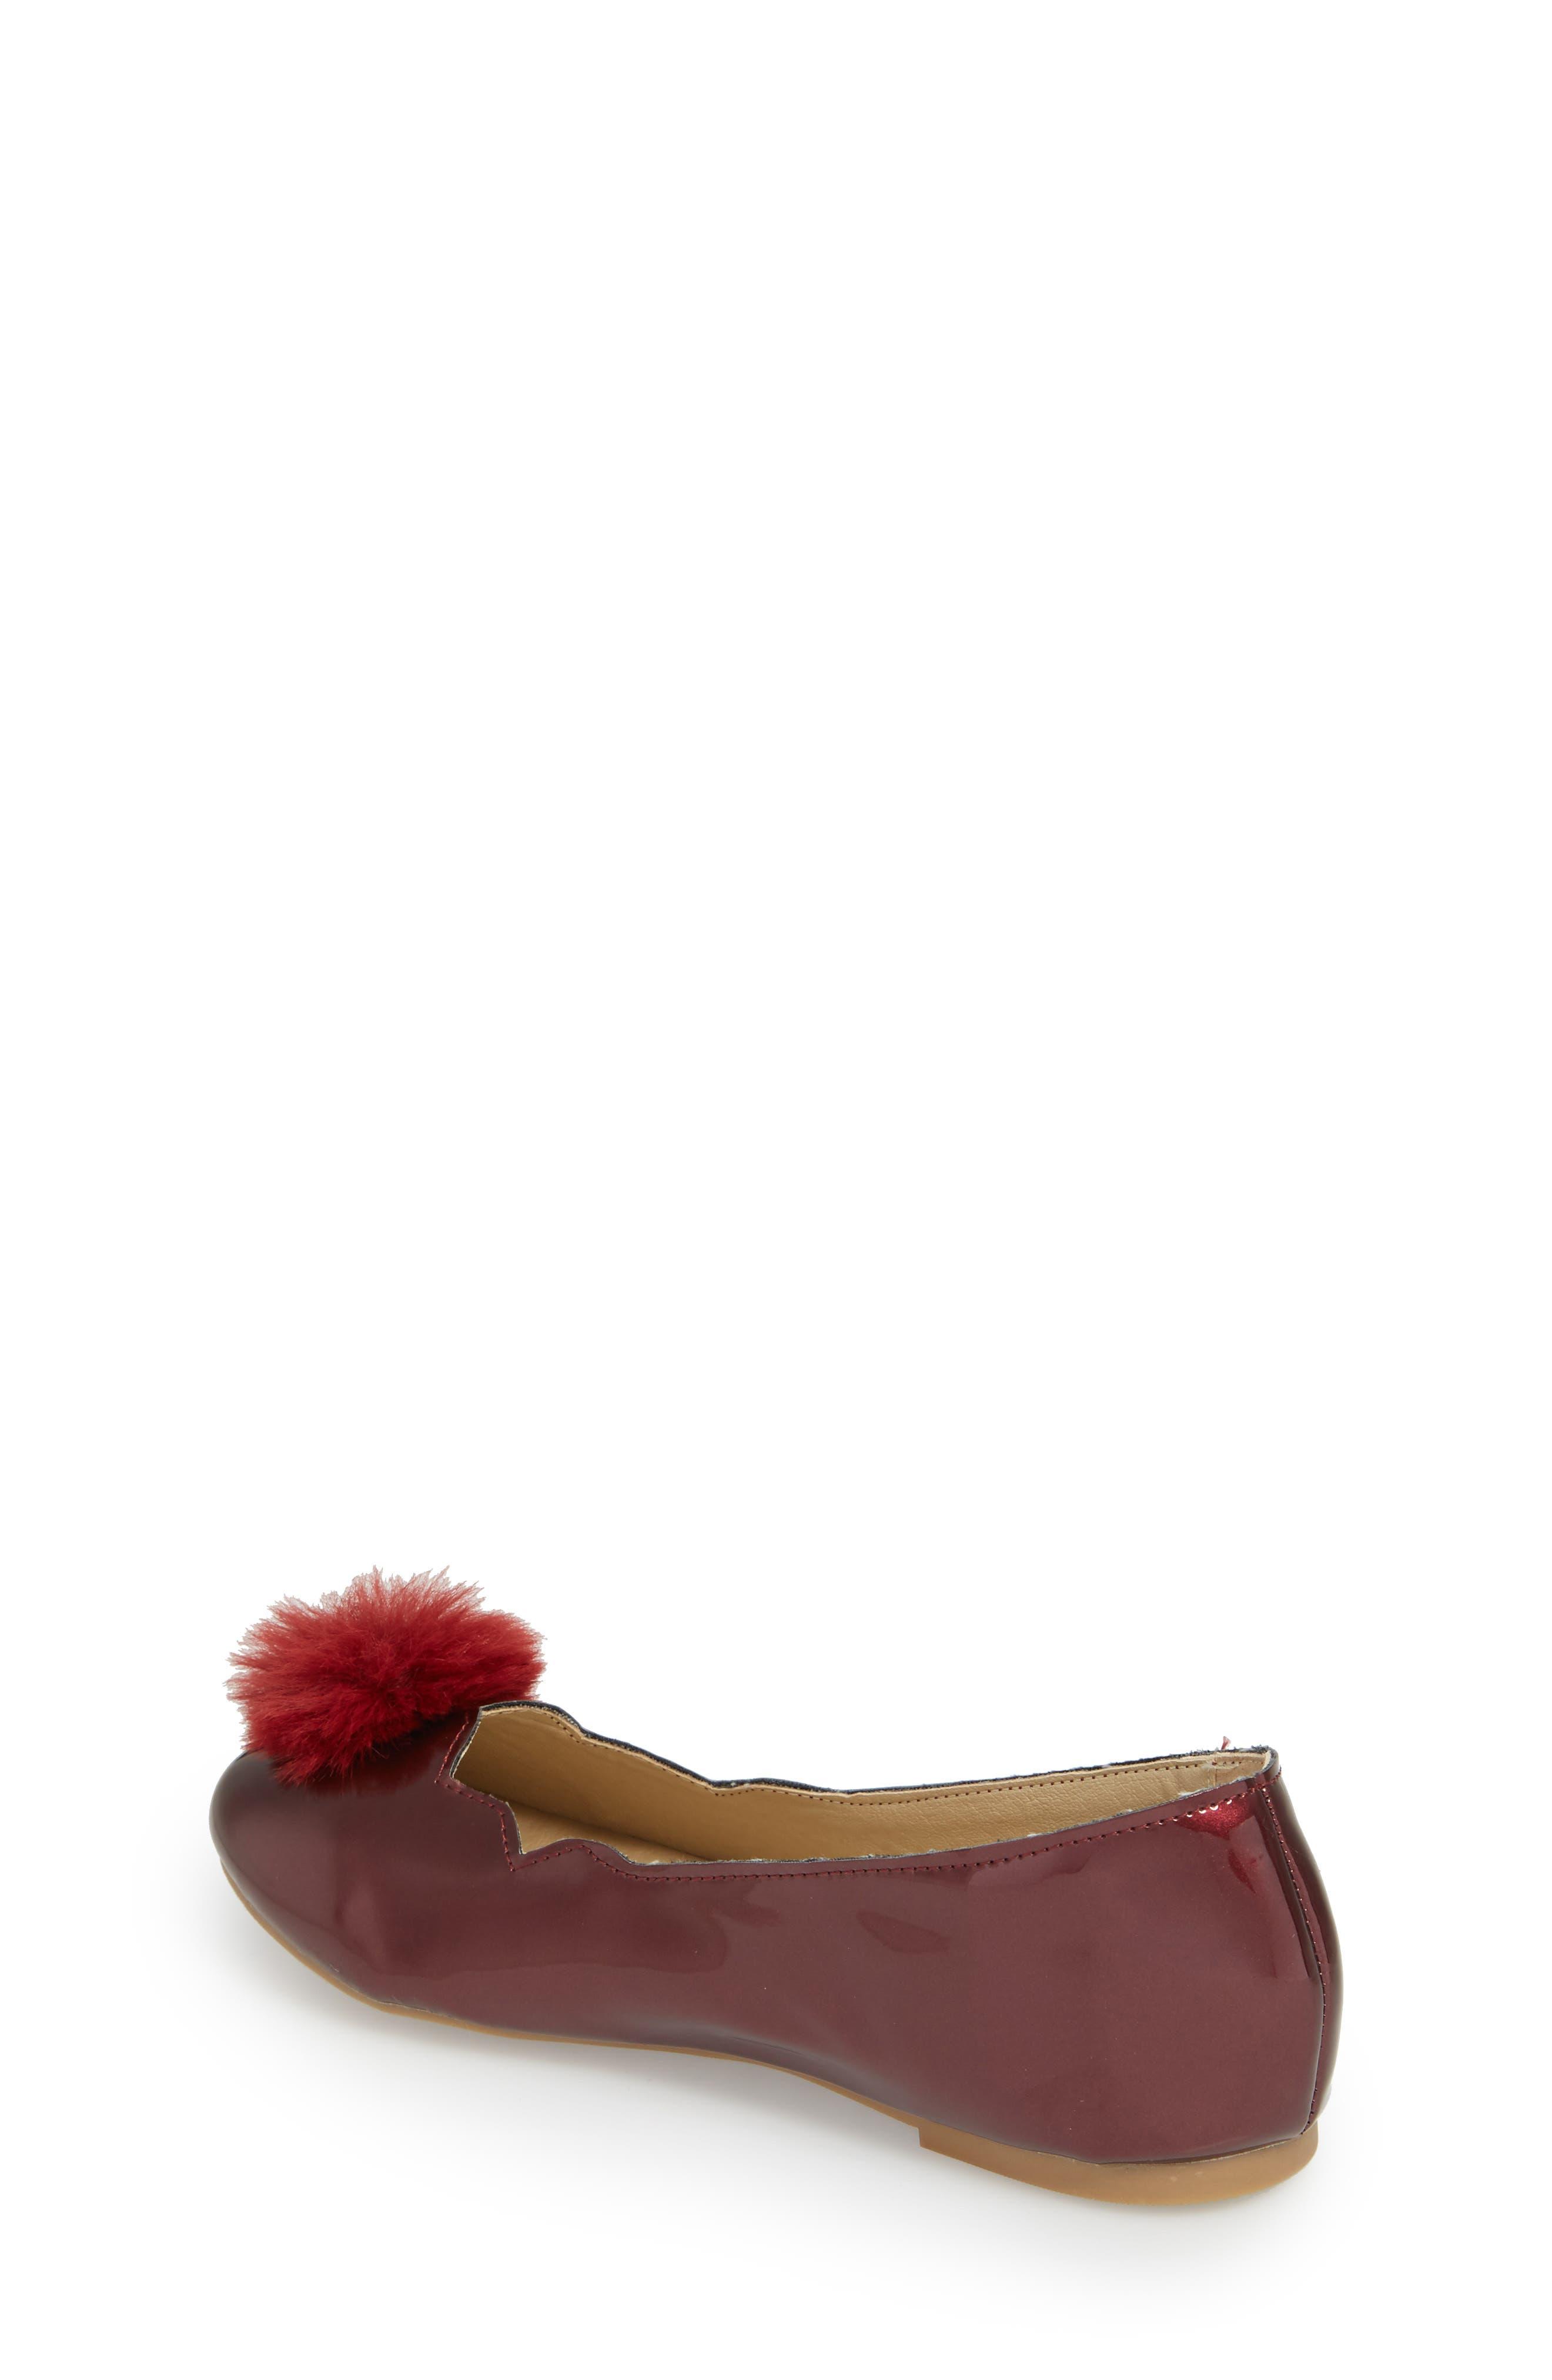 Felicia Anna Faux Fur Pom Flat,                             Alternate thumbnail 2, color,                             Maroon